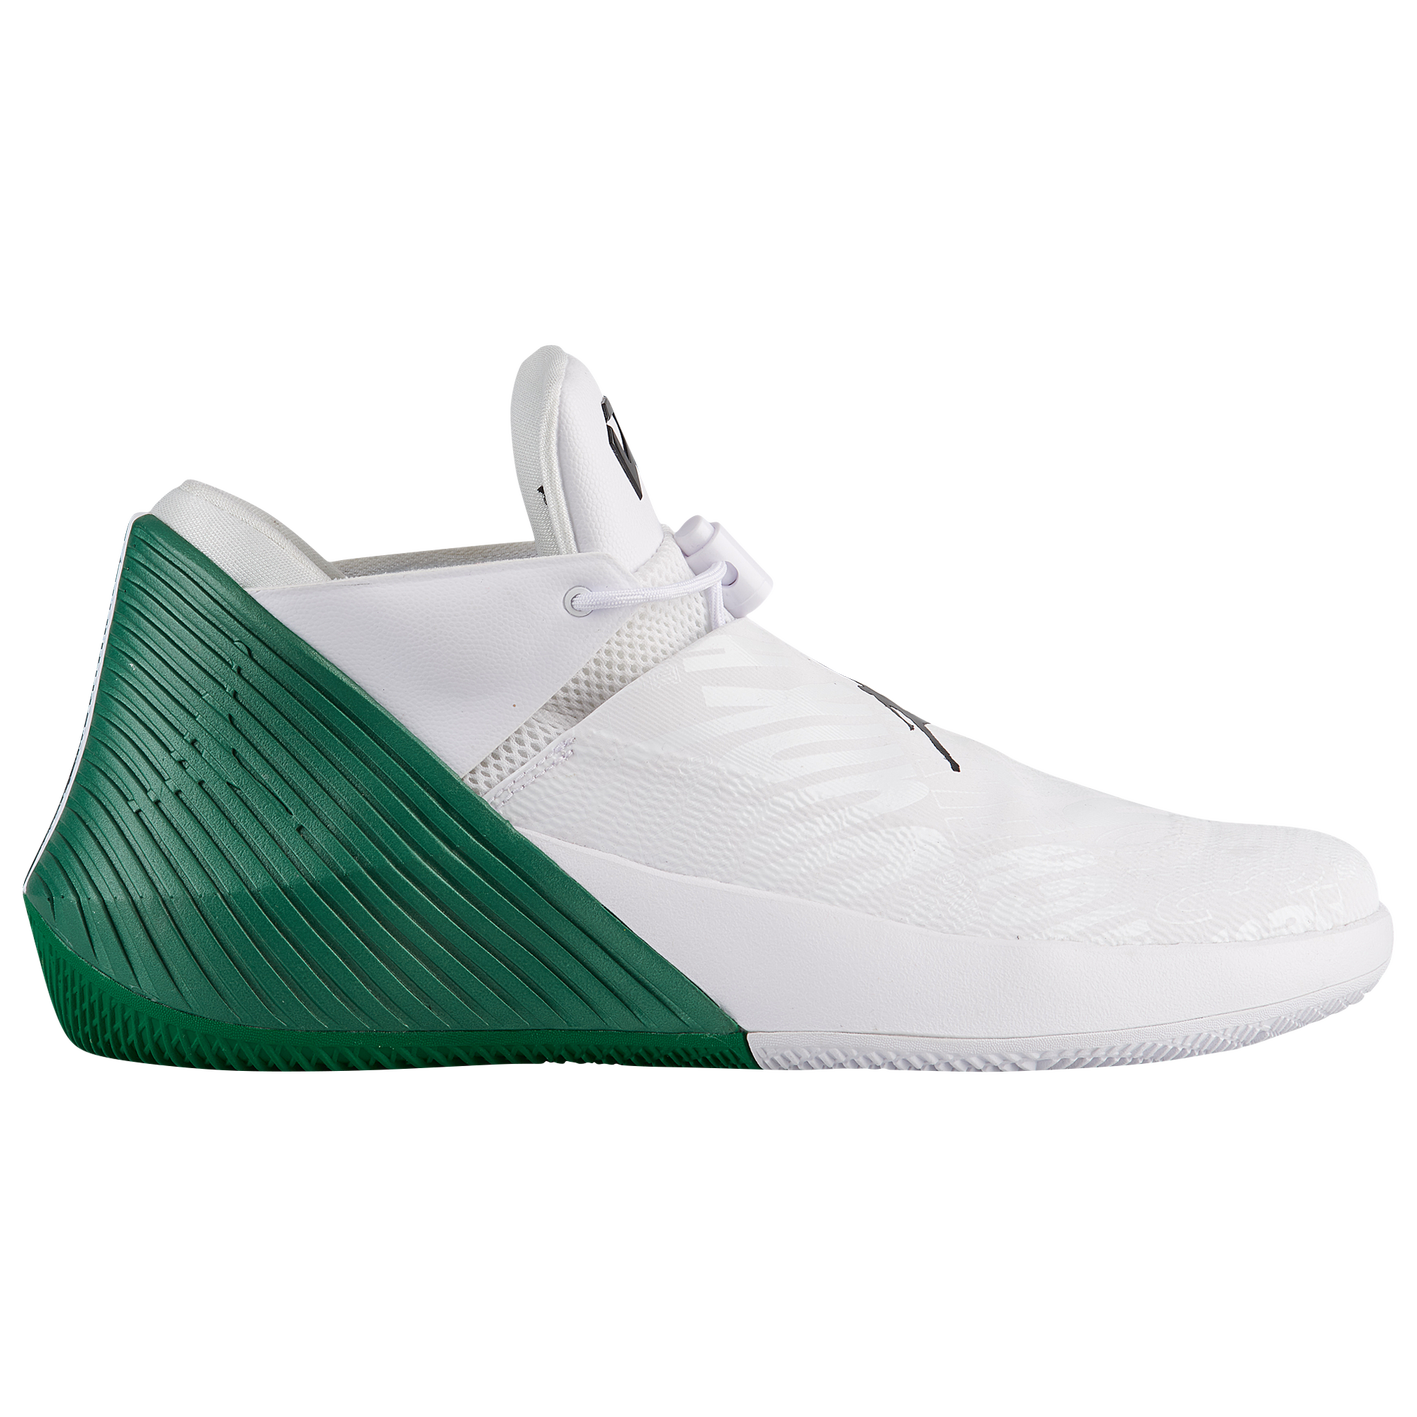 Jordan Why Not Zero.1 Low - Men s - Basketball - Shoes - Westbrook ... be55117c8